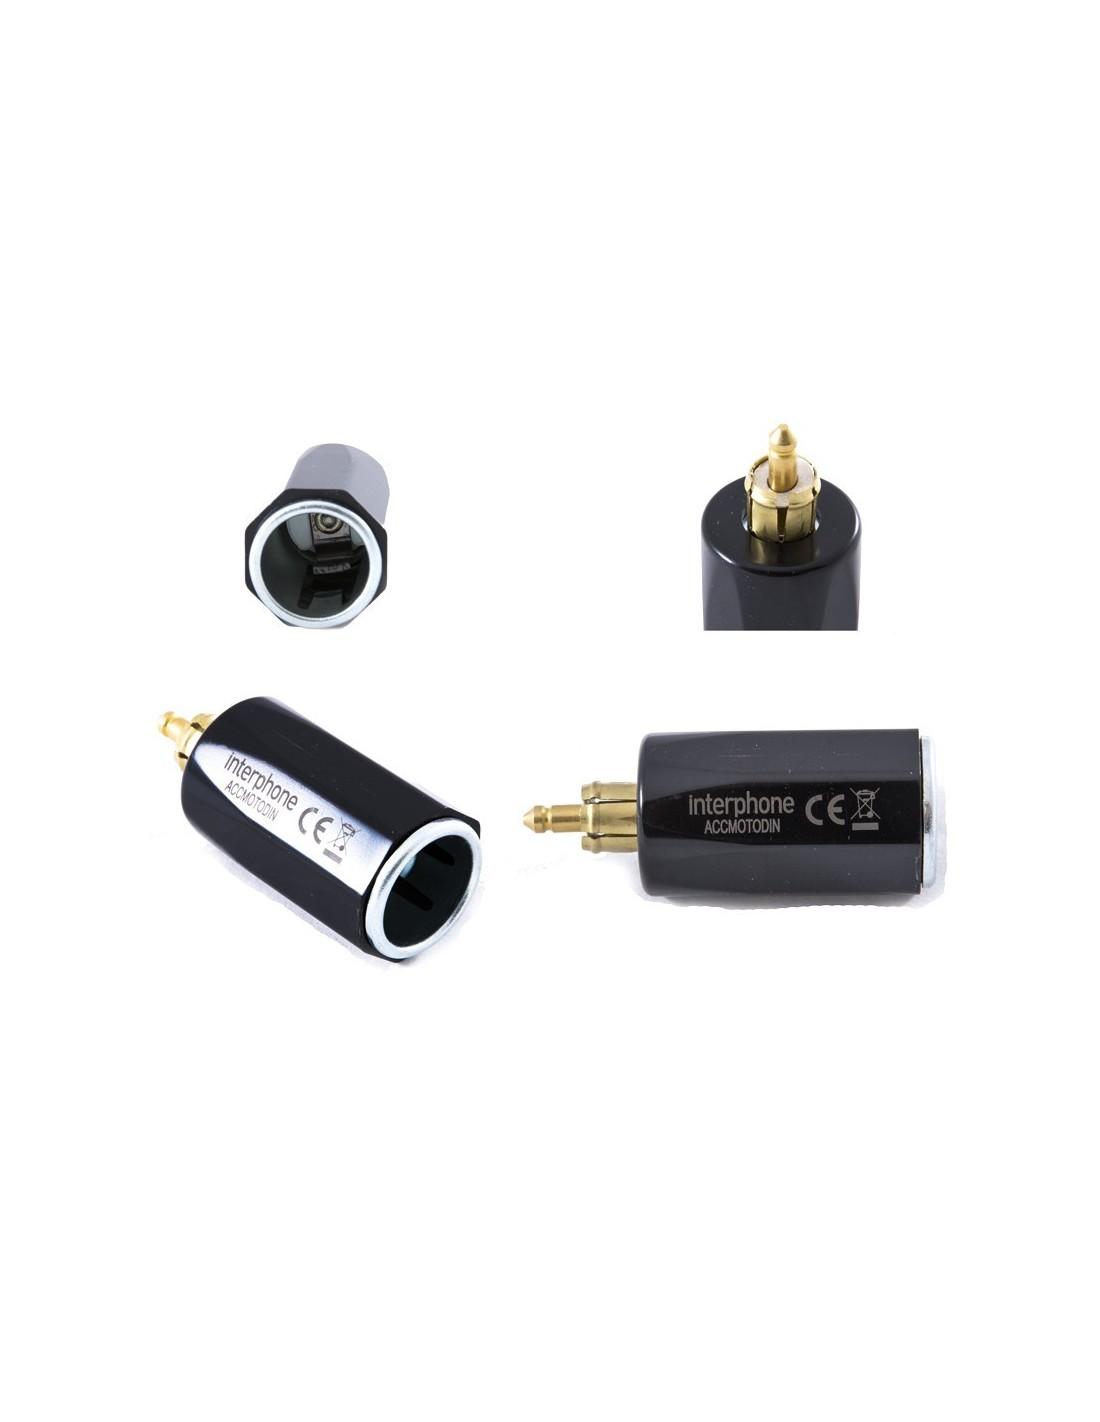 xde adapter 12v zigarettenanz nder mit din stecker ebay. Black Bedroom Furniture Sets. Home Design Ideas